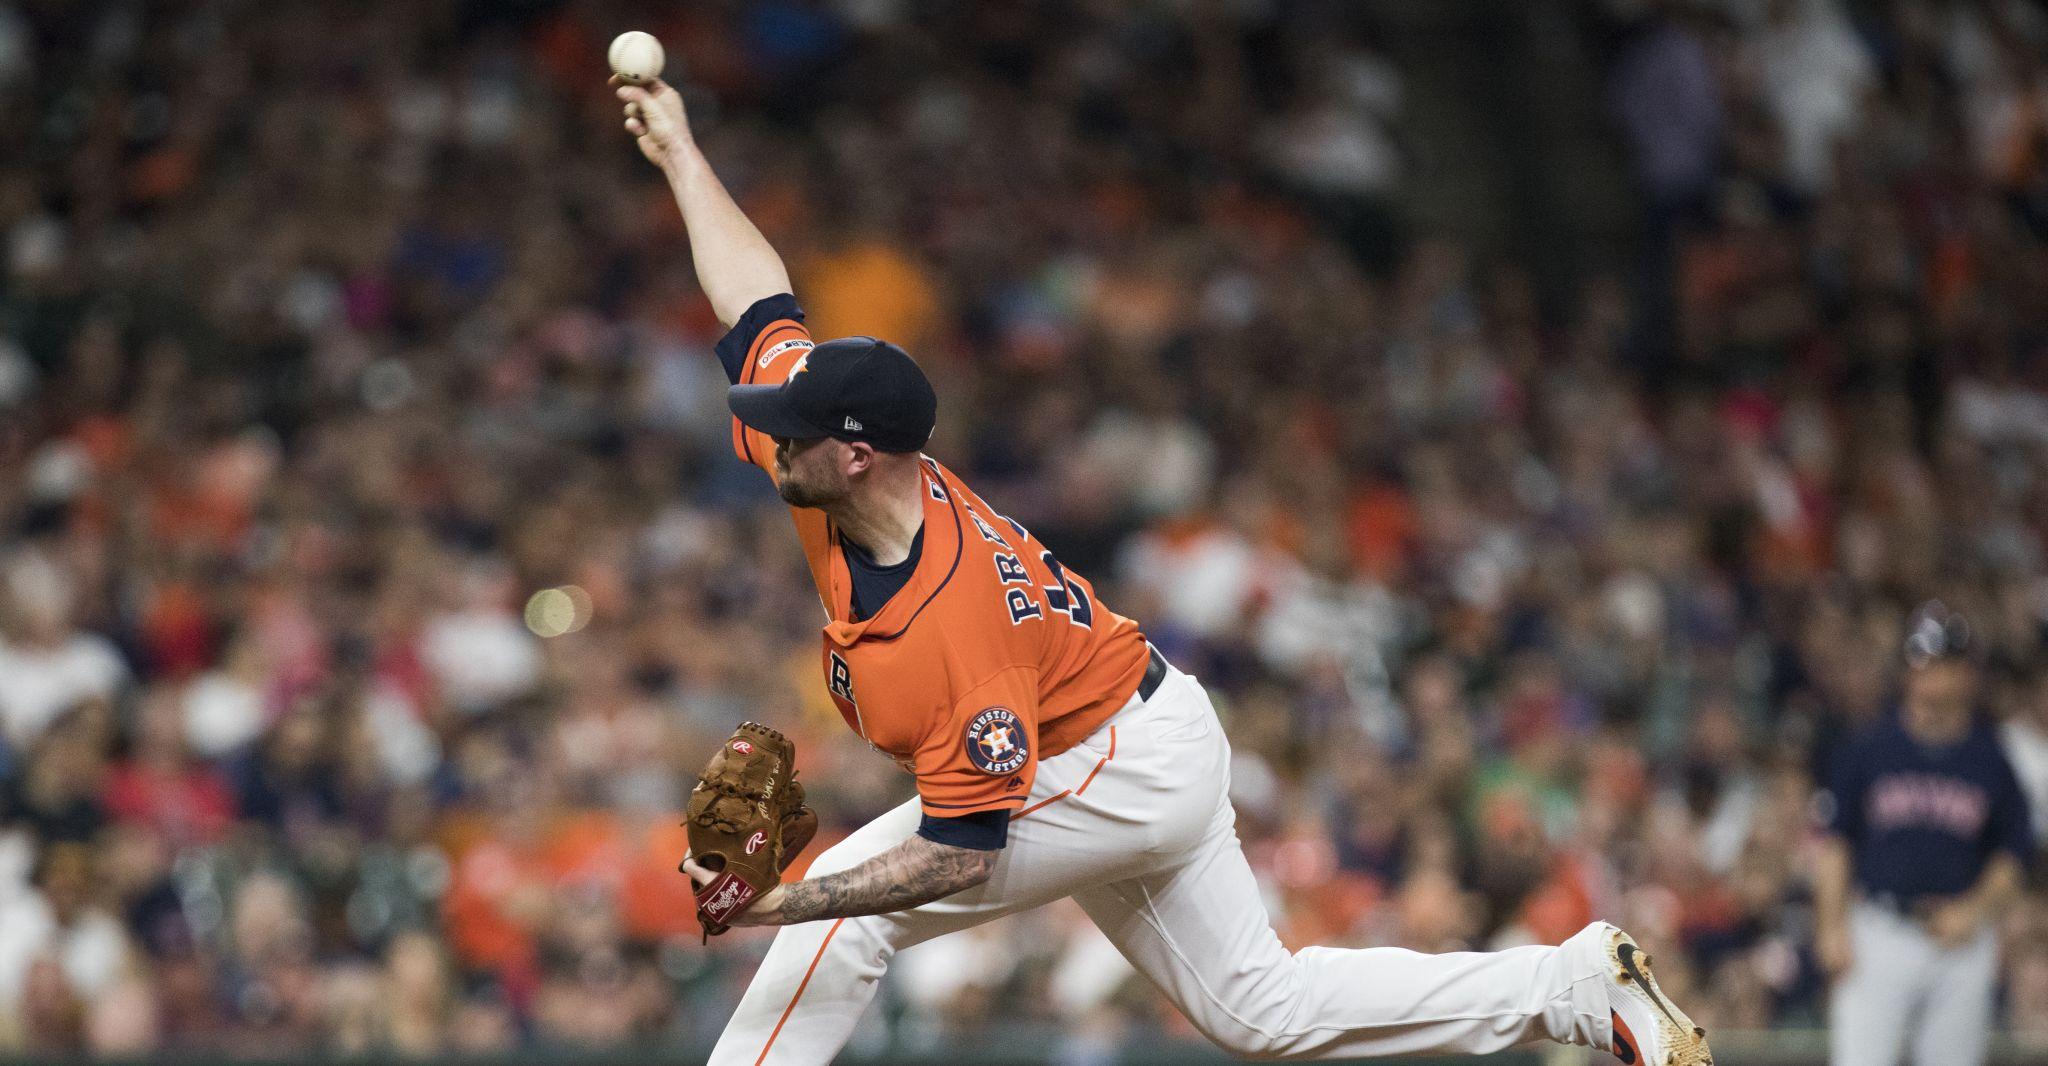 Astros injury update: Ryan Pressly, Brad Peacock showing progress